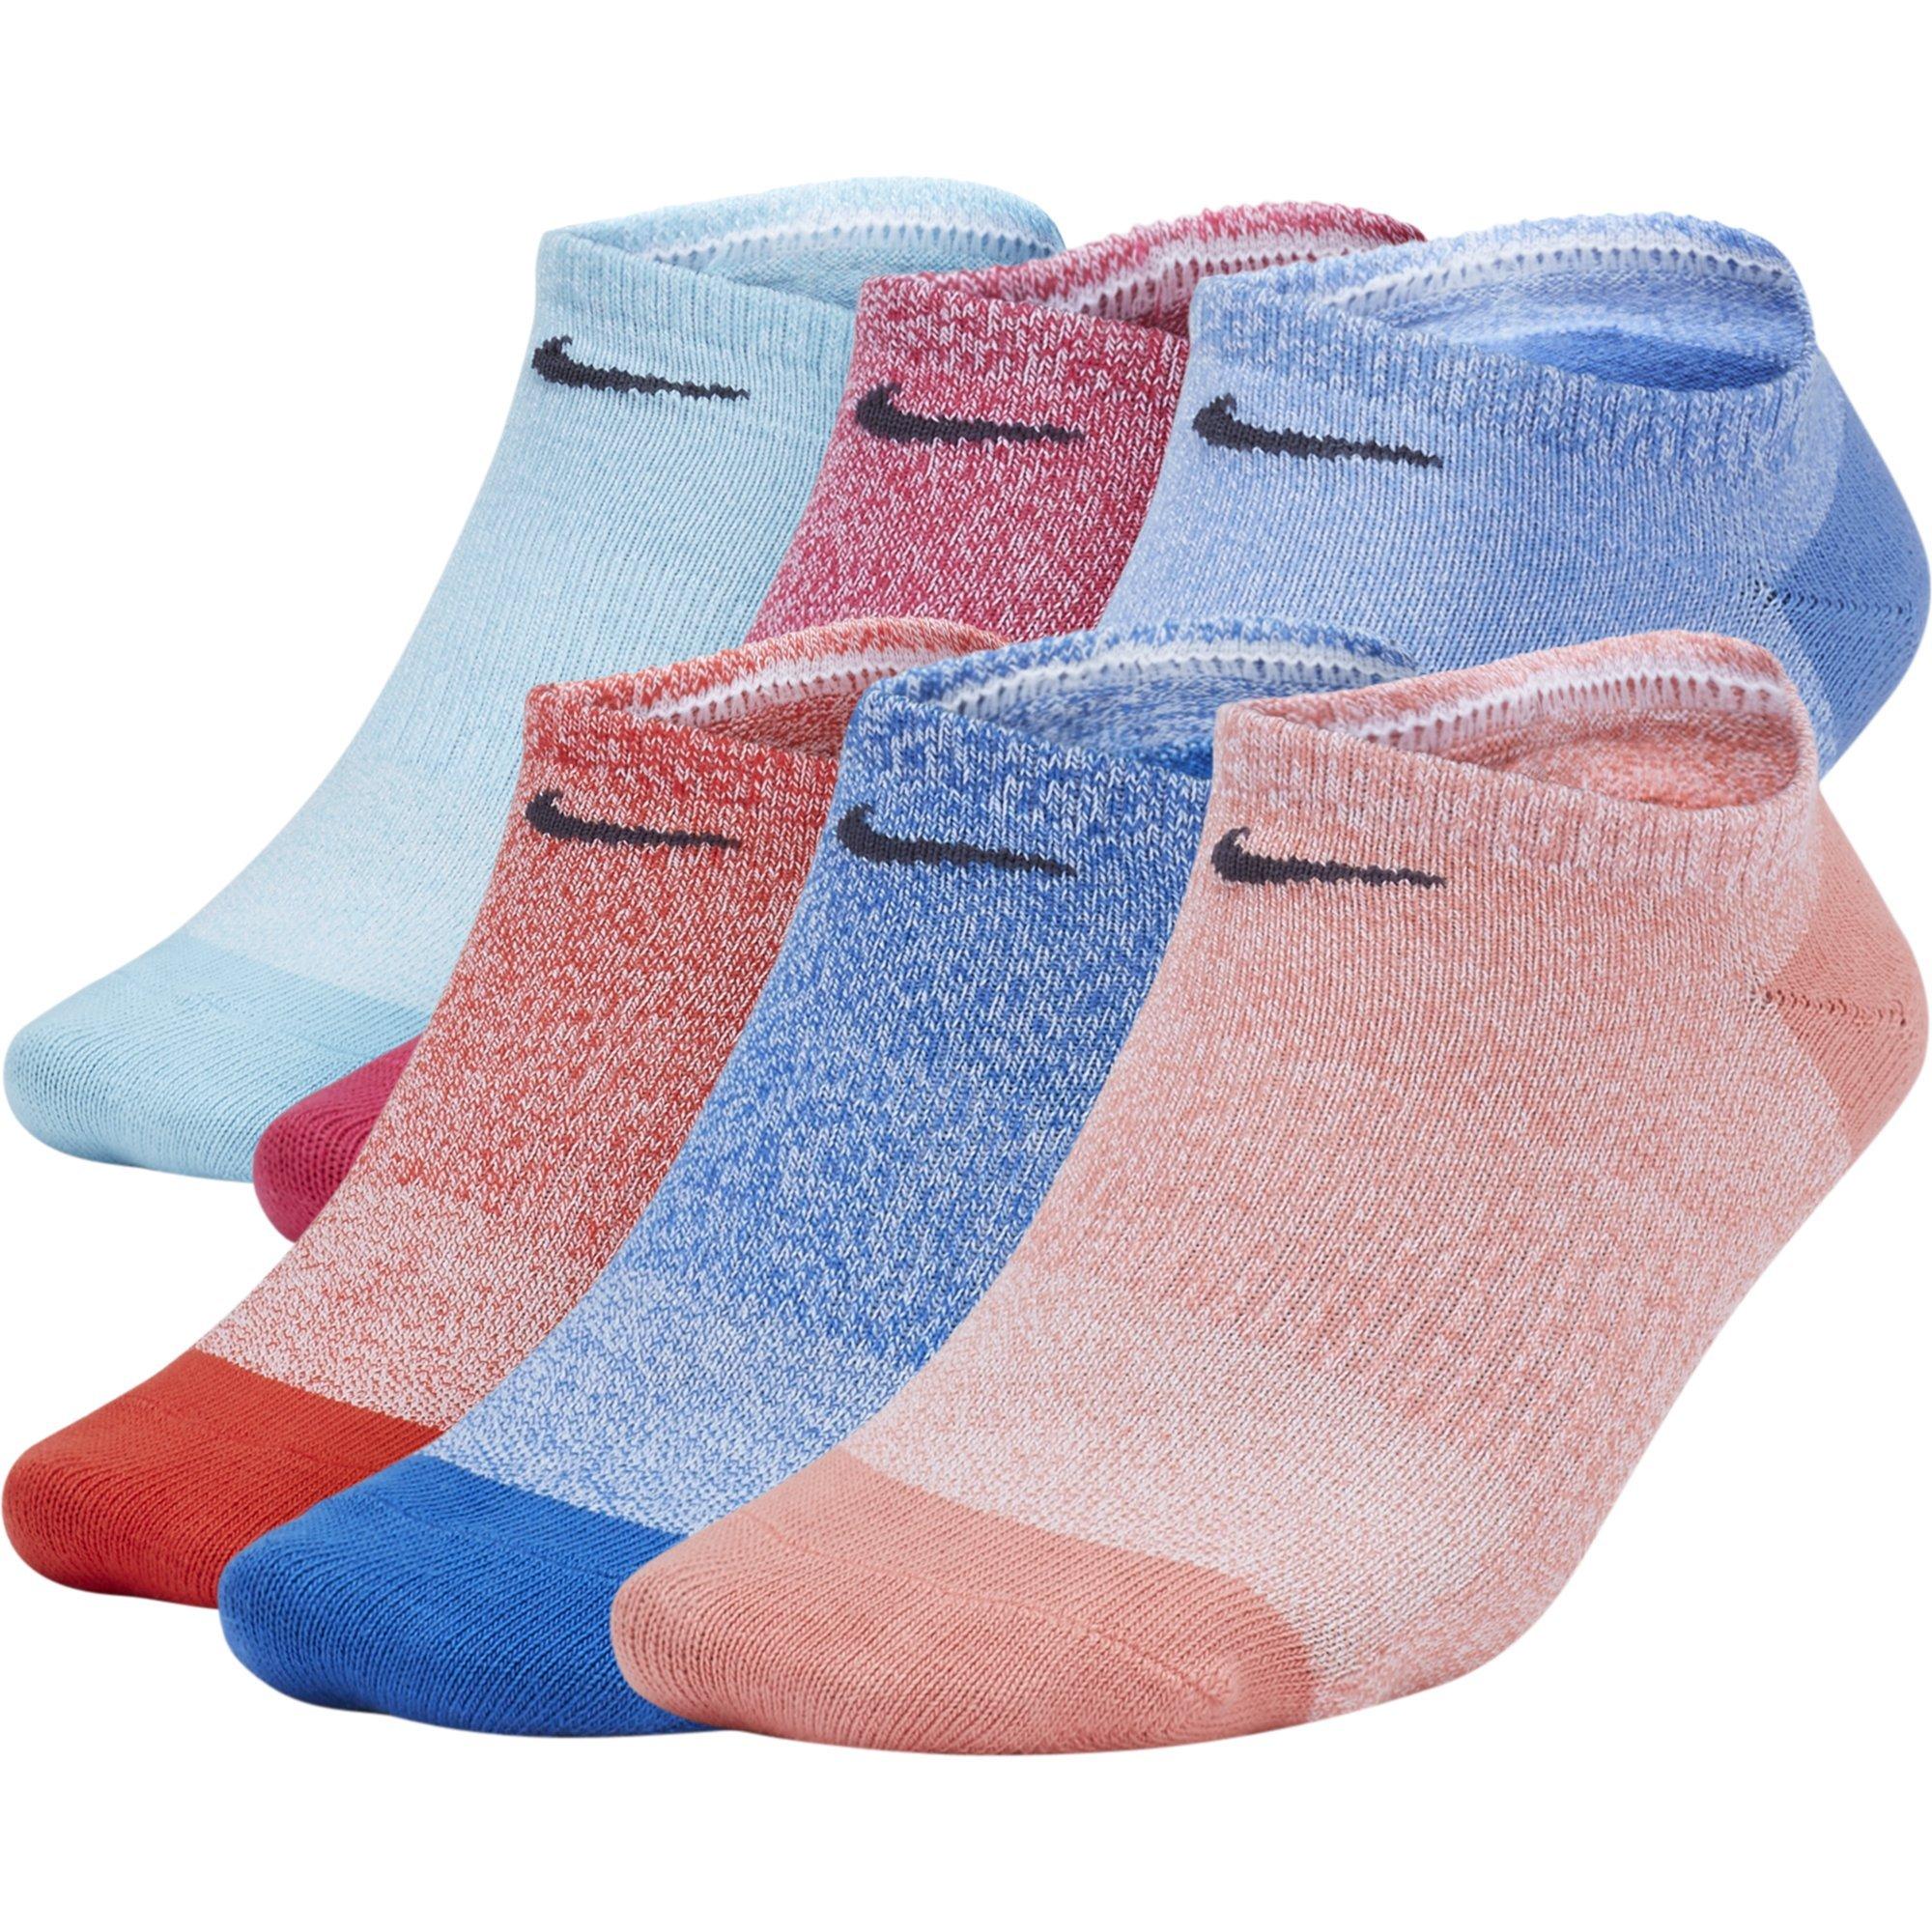 NIKE Women's Everyday Lightweight No-Show Socks (6 Pairs), Multi-Color (921), Medium